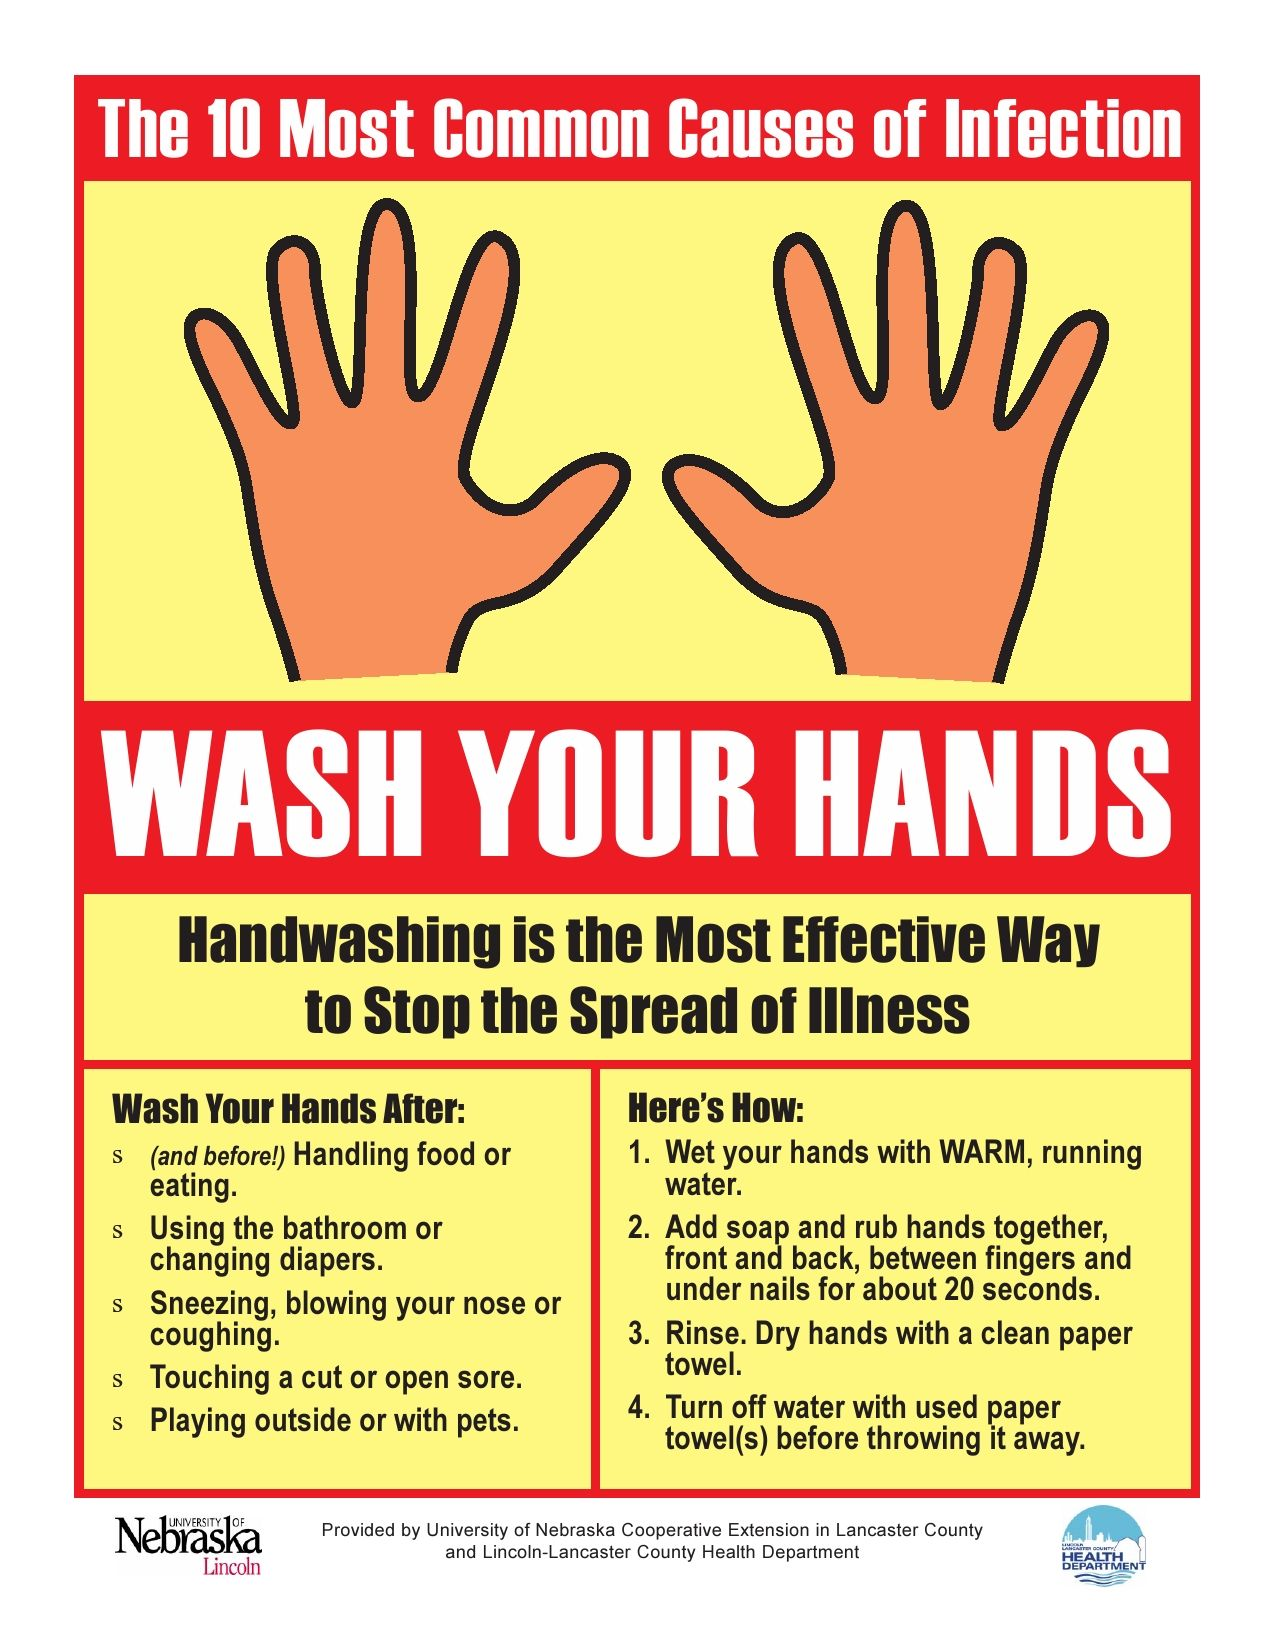 World Health Organisation Guidance On Handwashing And Handrubbing